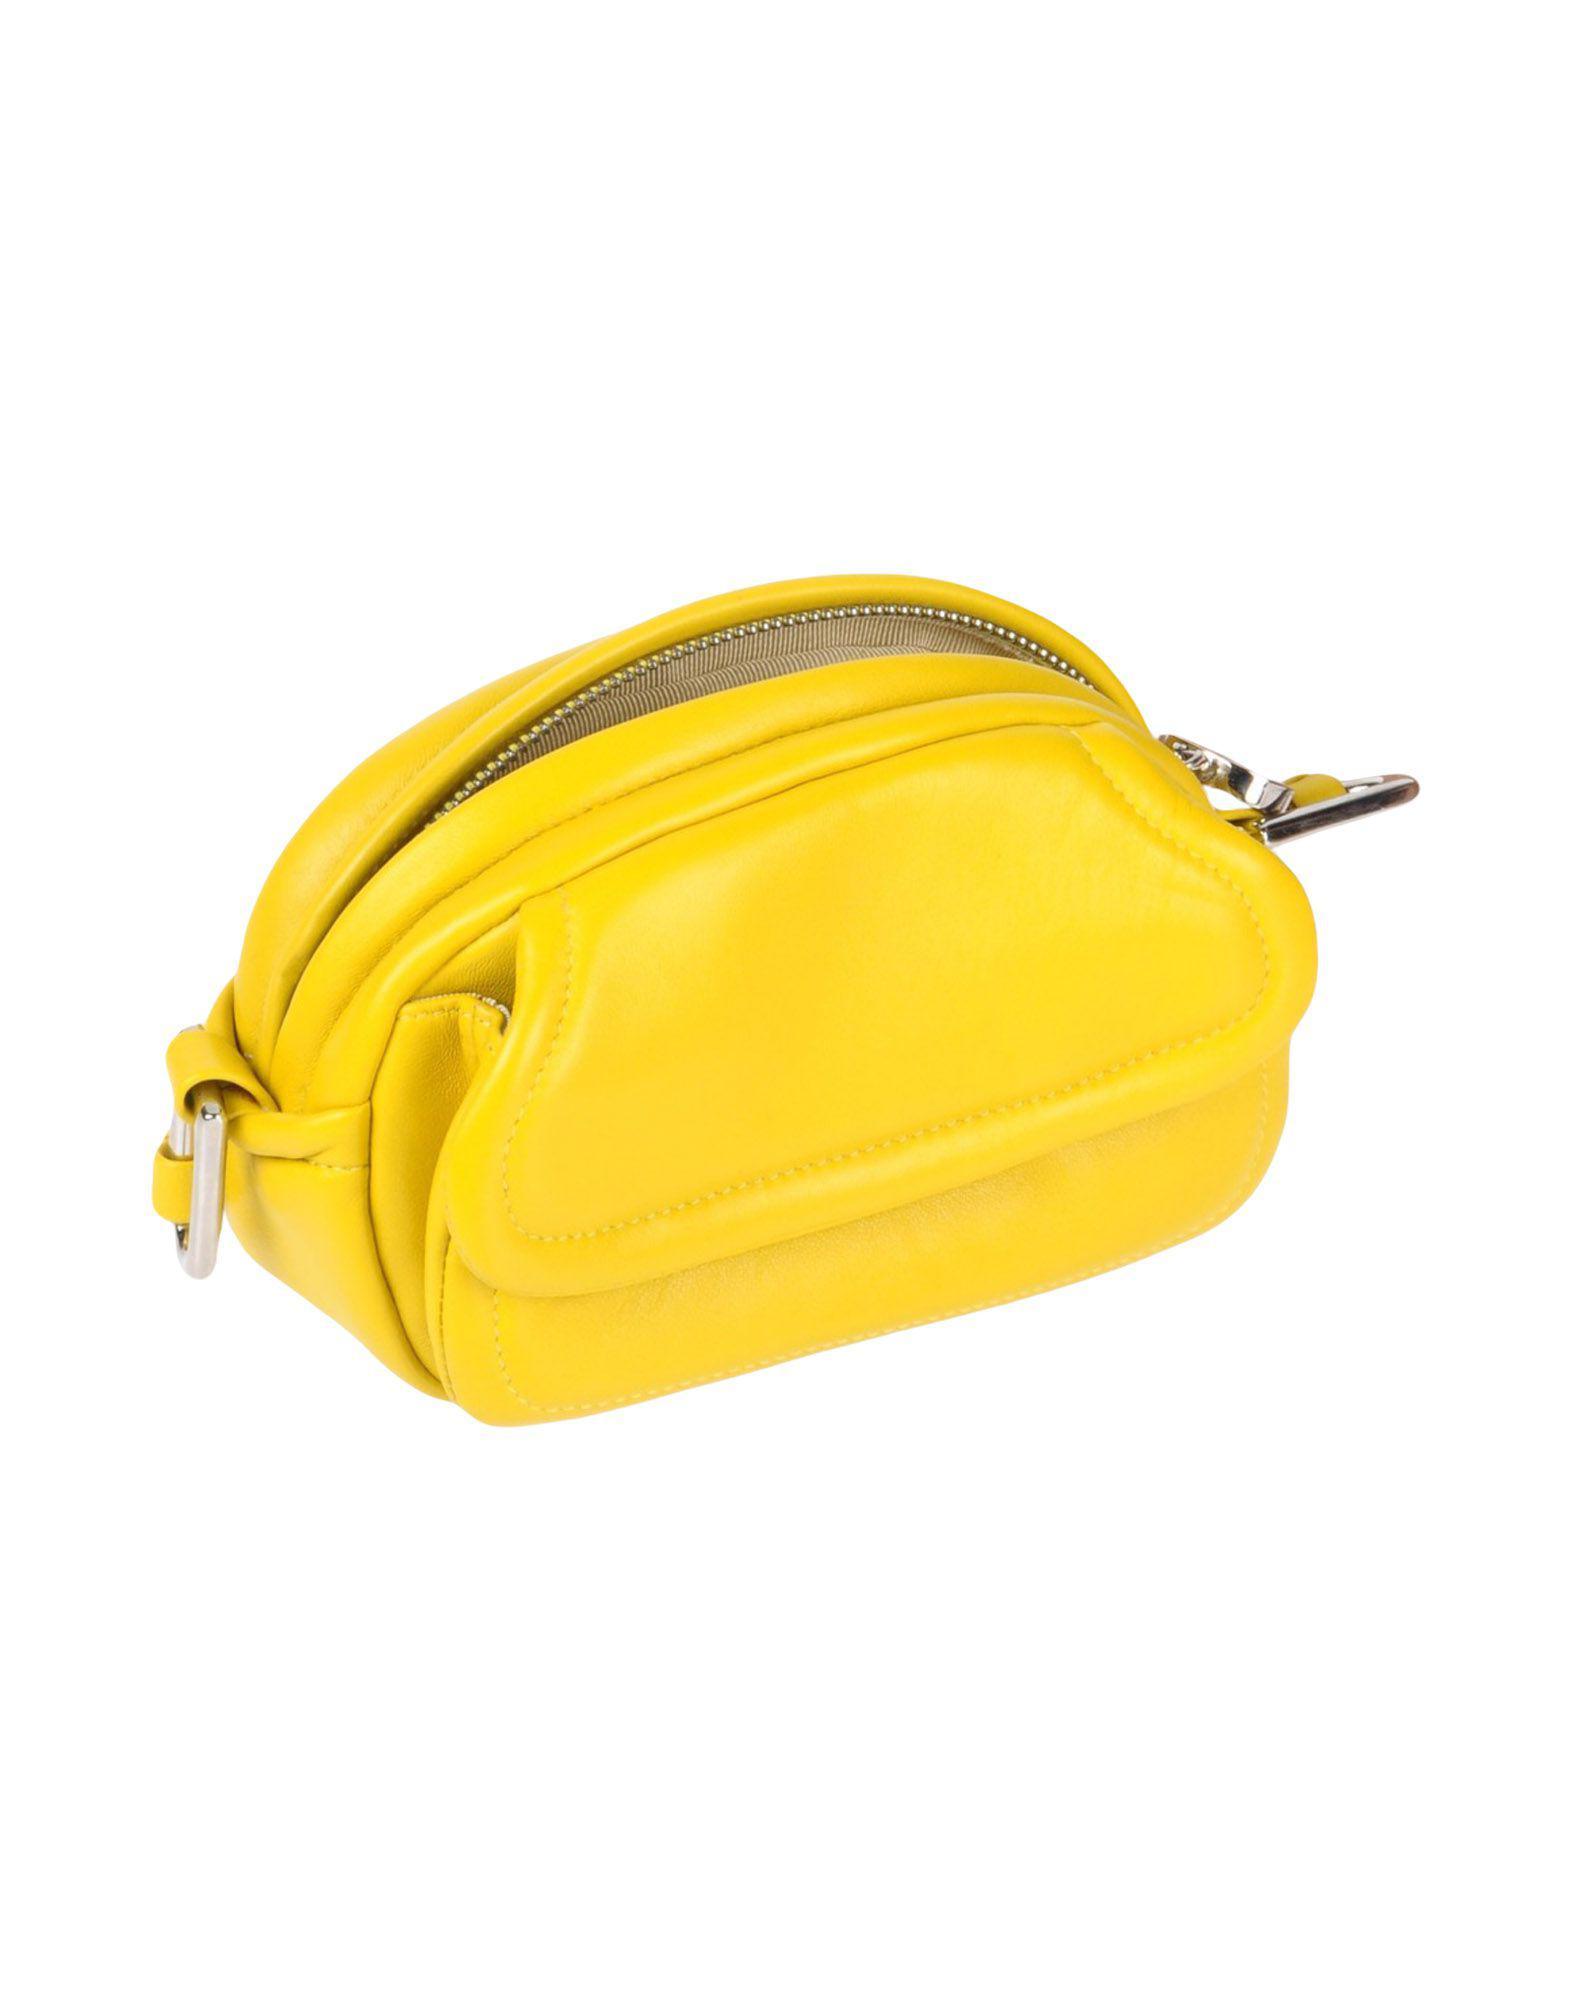 Rodo Leather Cross-body Bag in Yellow